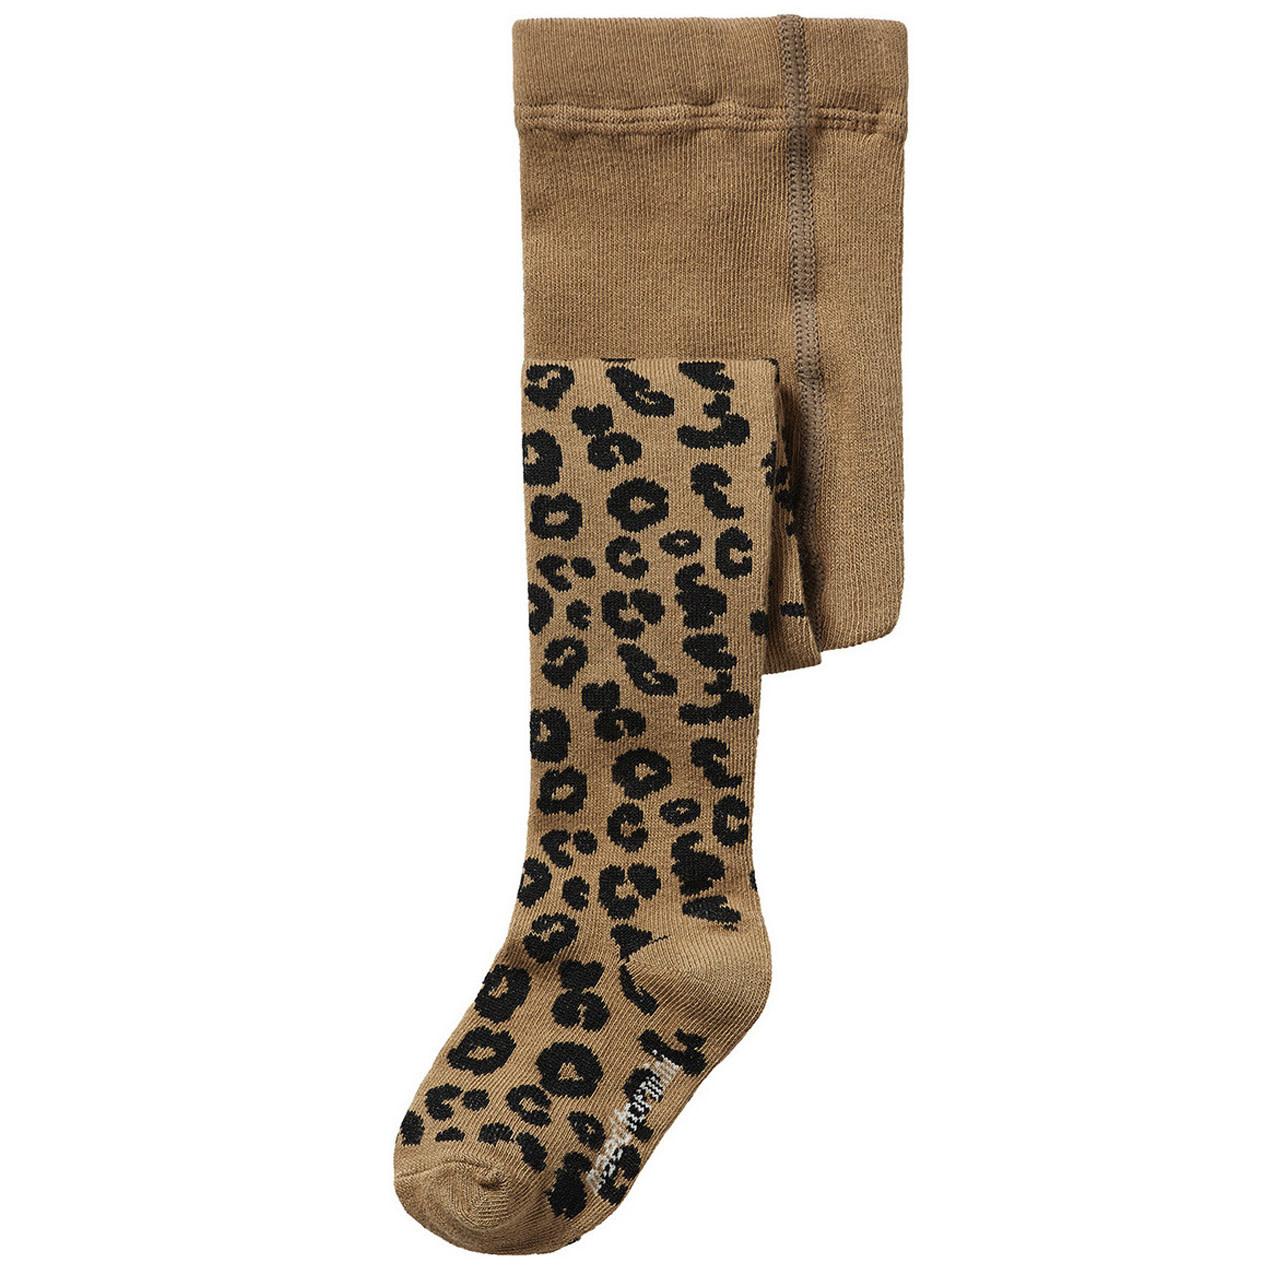 Maed For mini Mead For Mini - Brown Leopard Tights